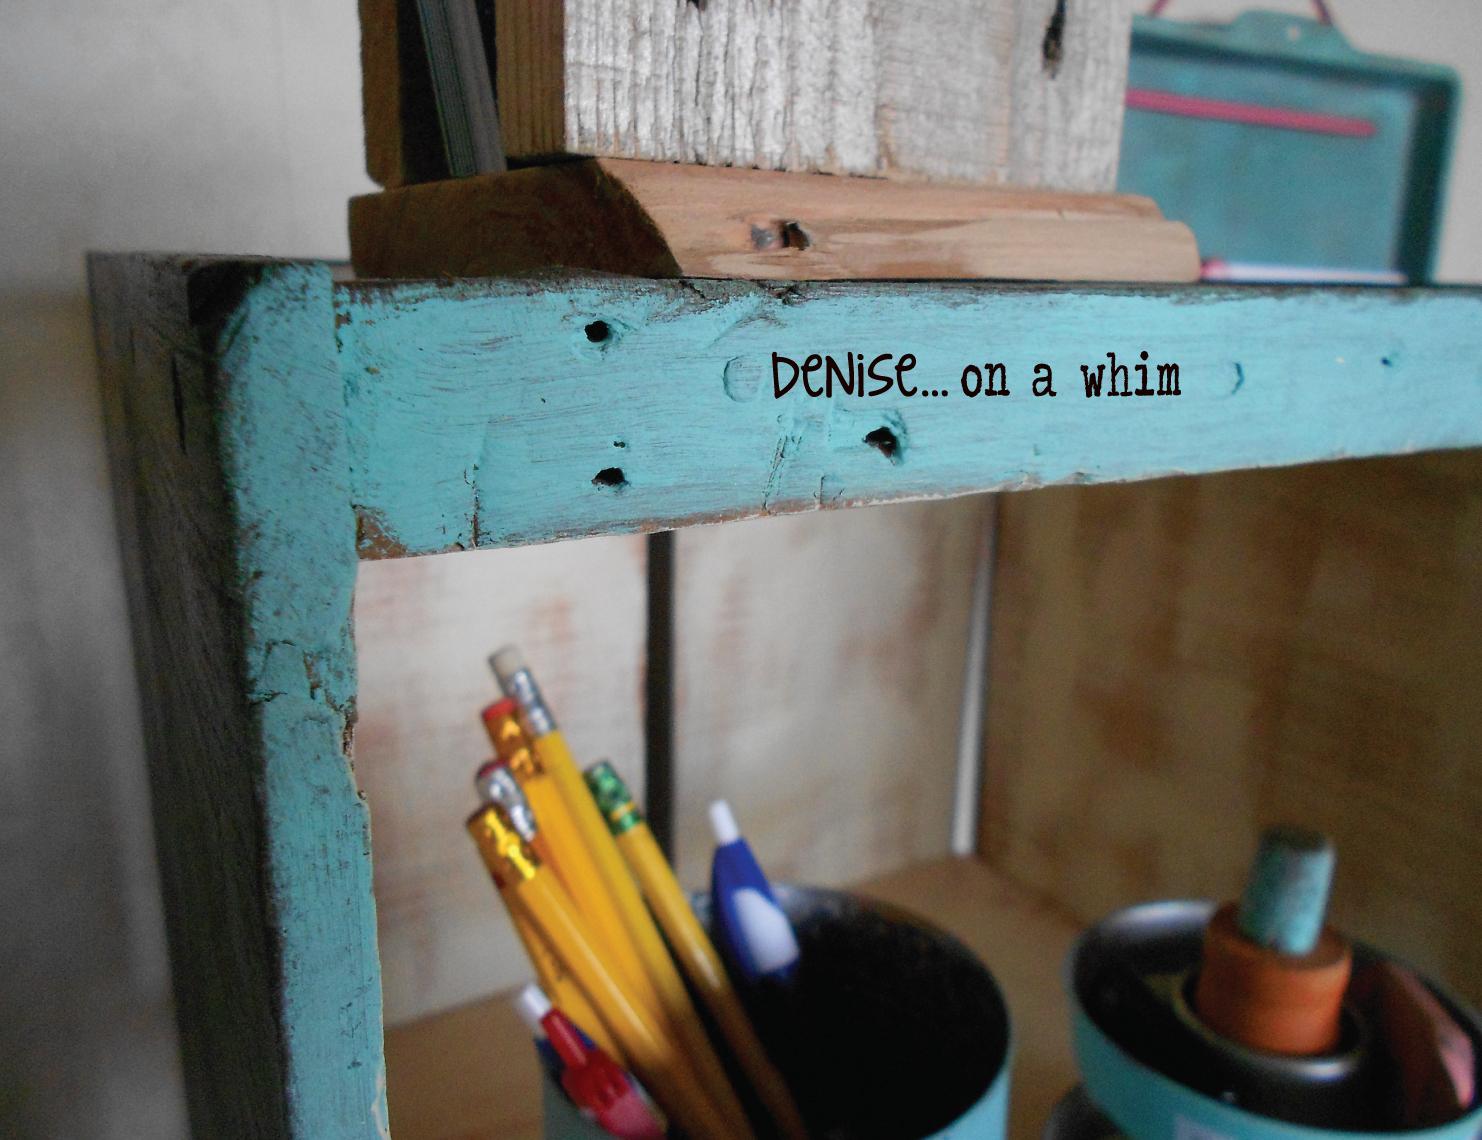 http://4.bp.blogspot.com/-LKj42-27It8/UXqcn51SbSI/AAAAAAAACow/w9PGy_MRq6I/s1600/CrateOfiiceOrganizer6.jpg